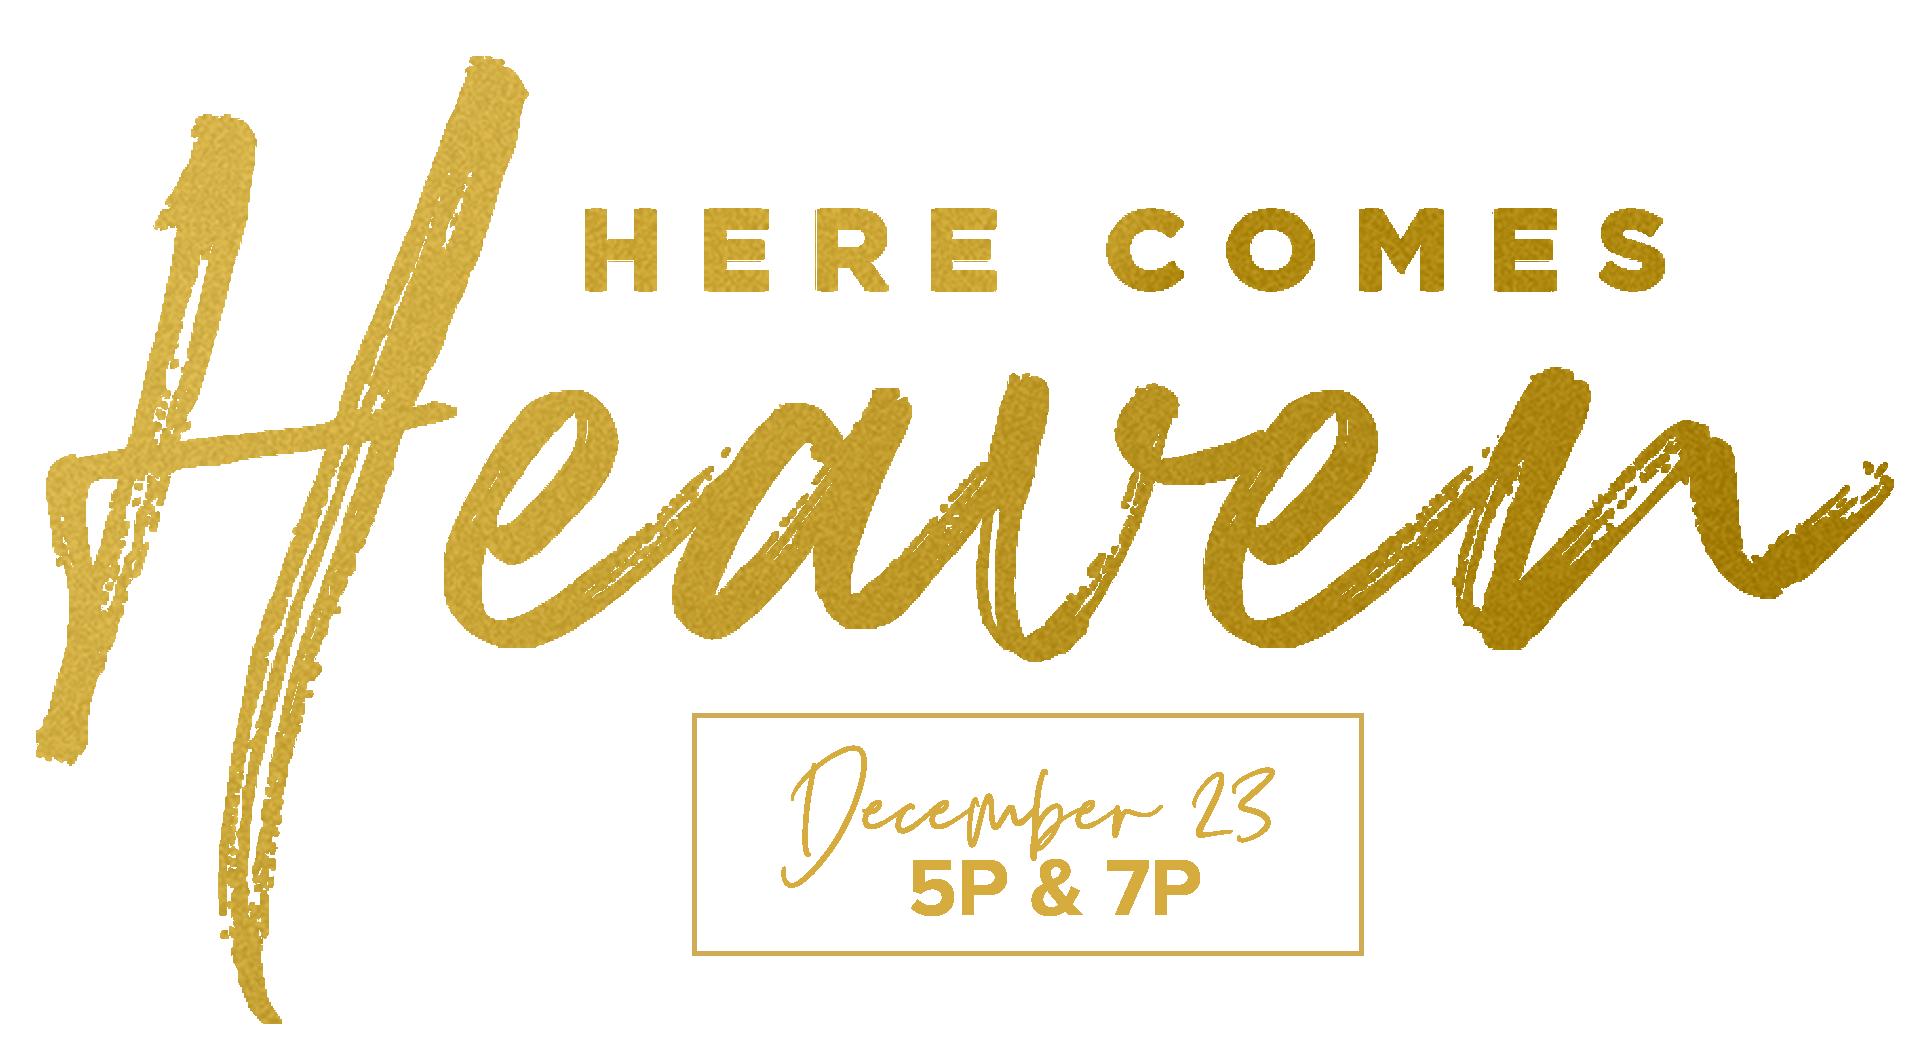 Here Comes Heaven -01